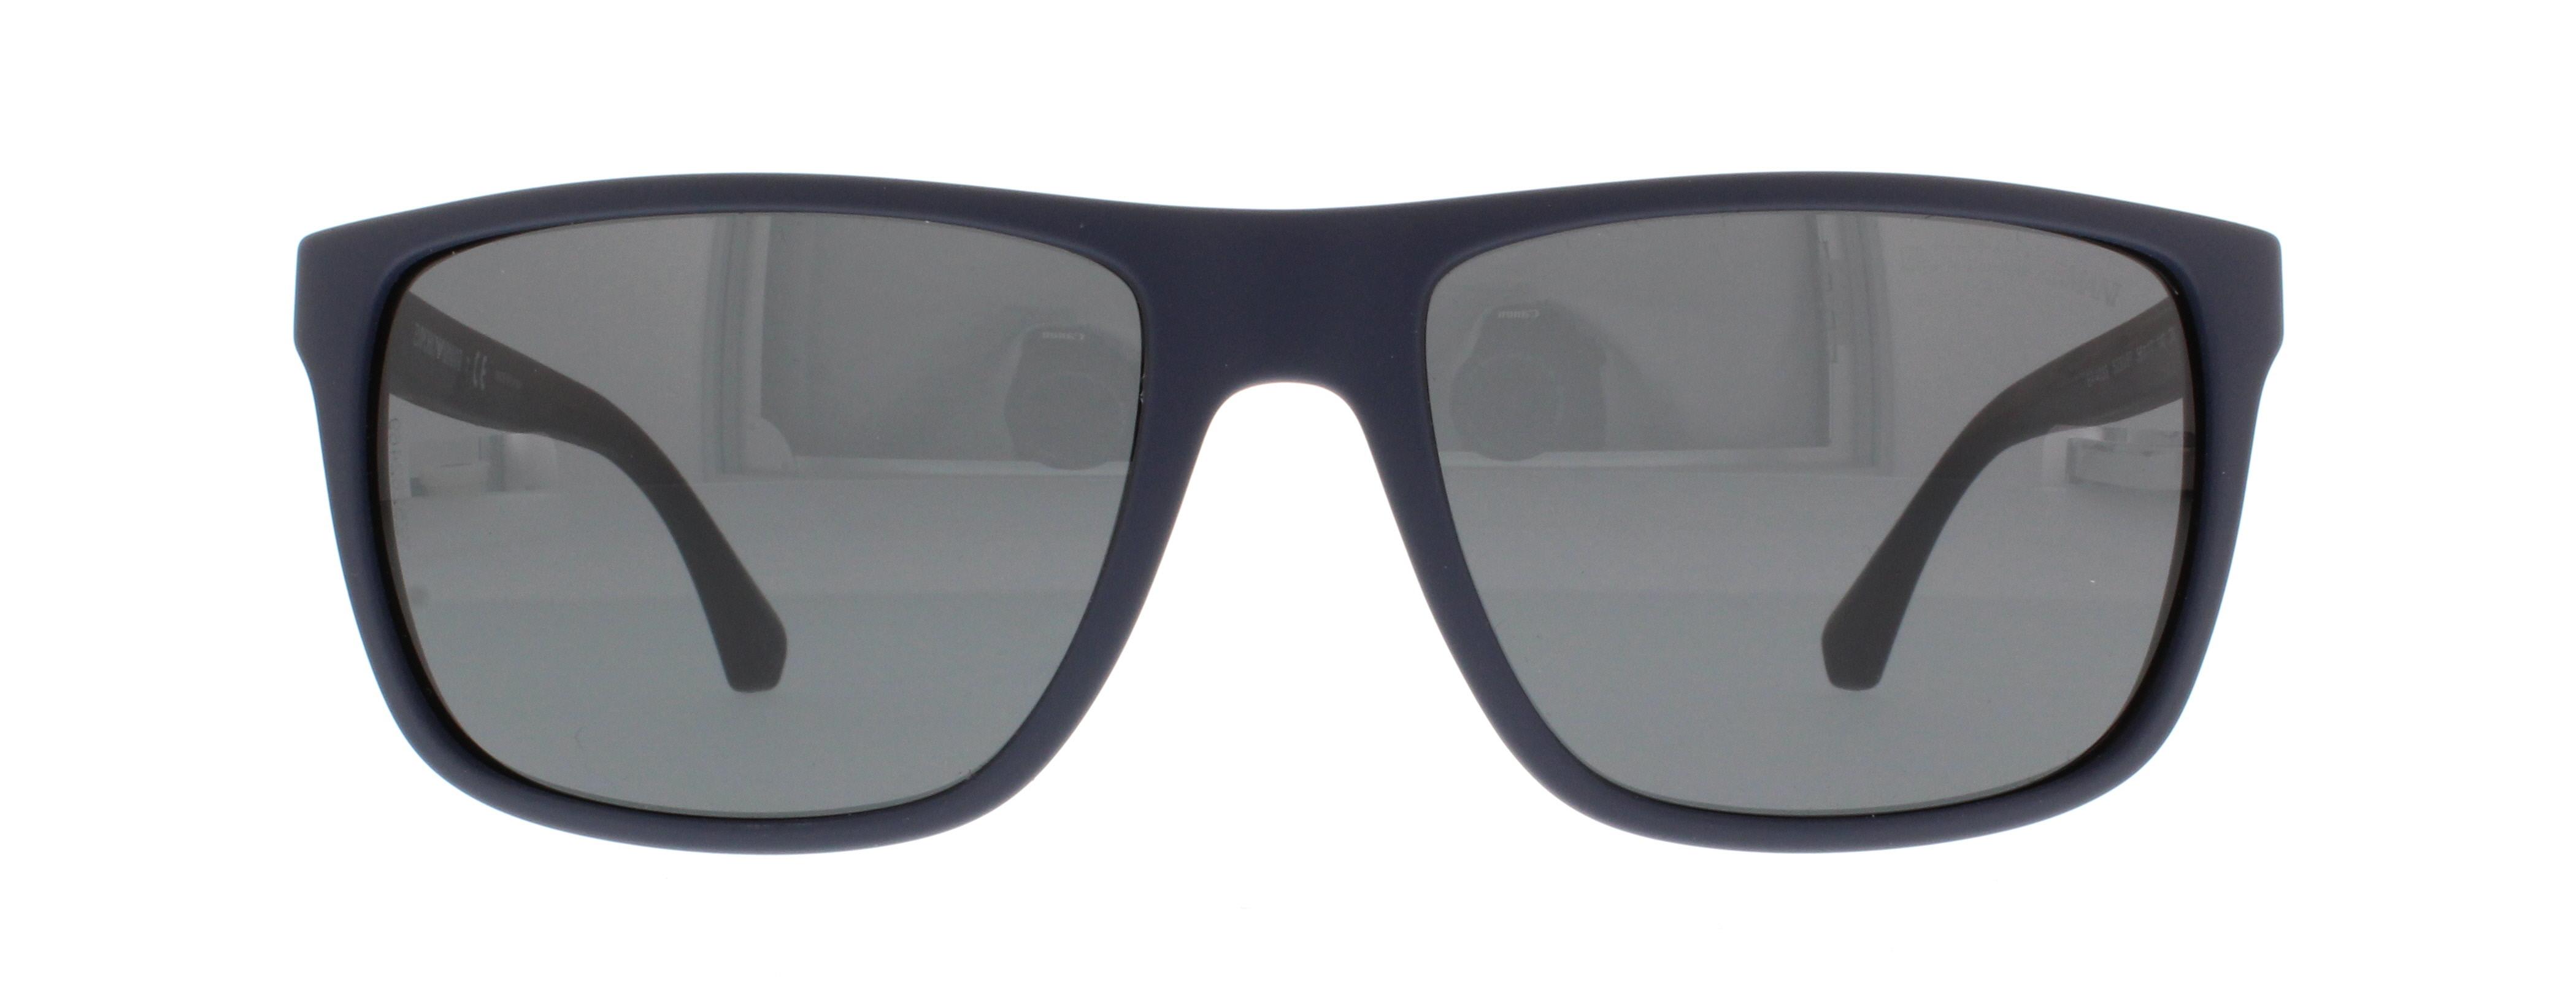 968186bb21c9 Designer Frames Outlet. Emporio Armani EA4033